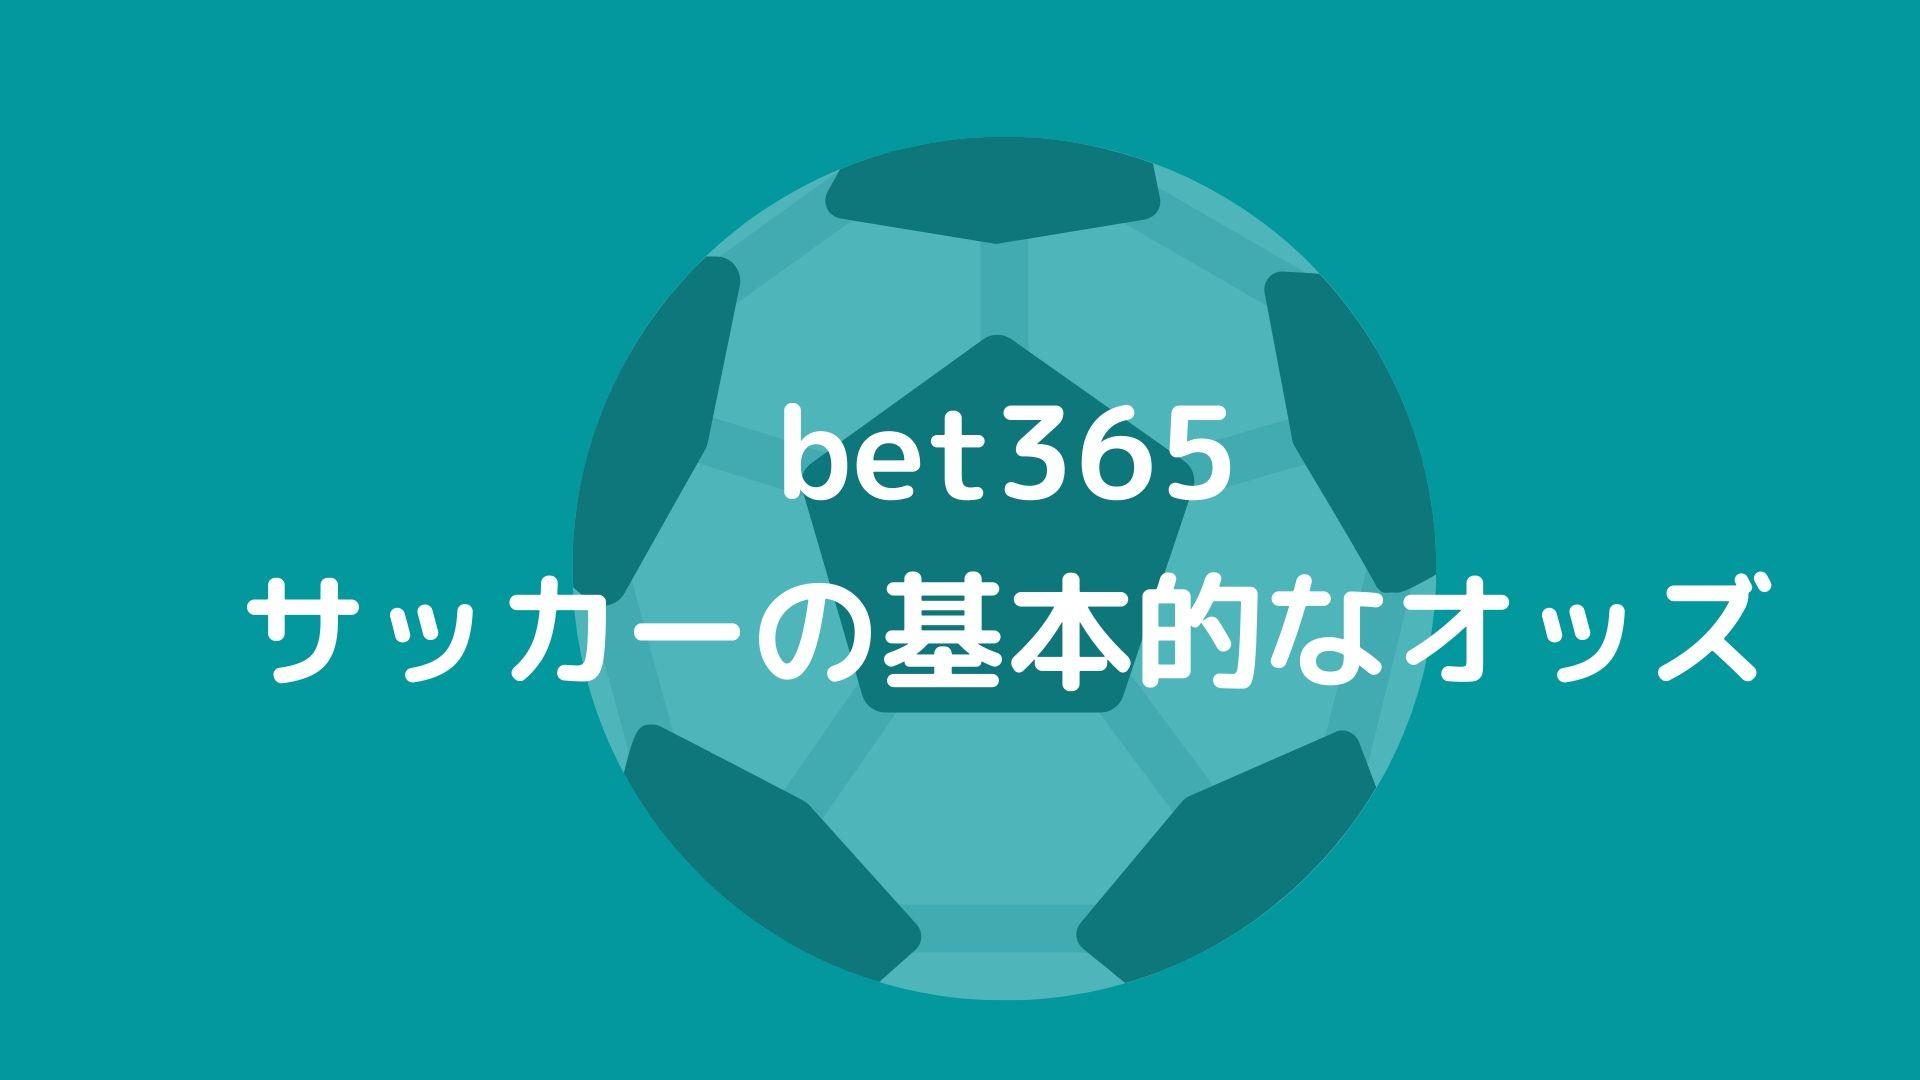 bet365,サッカー,オッズ